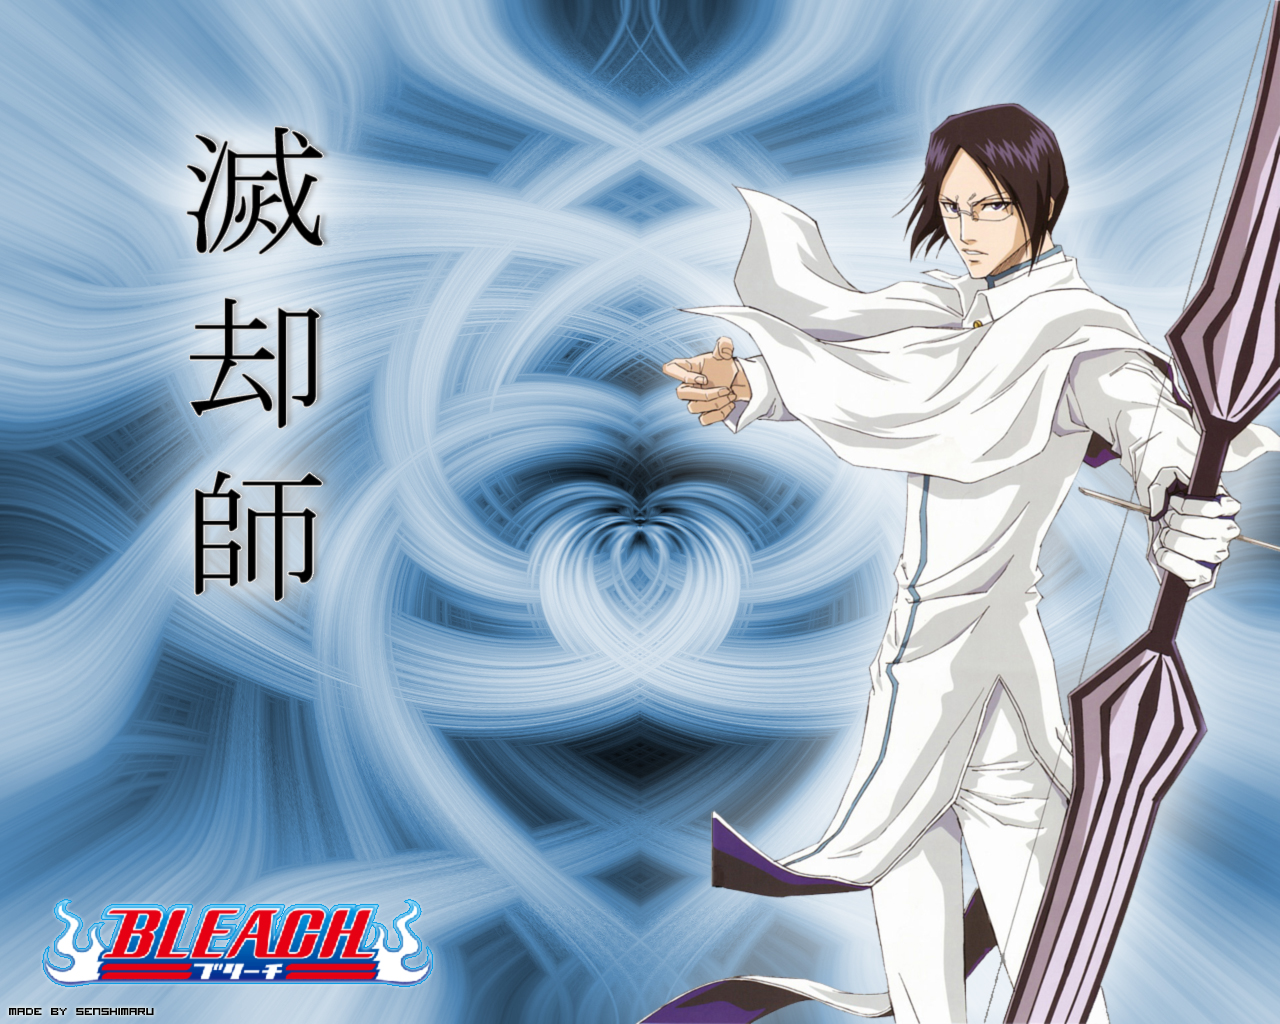 Uryu Ishida Bow Uryu Ishida Final Form vs